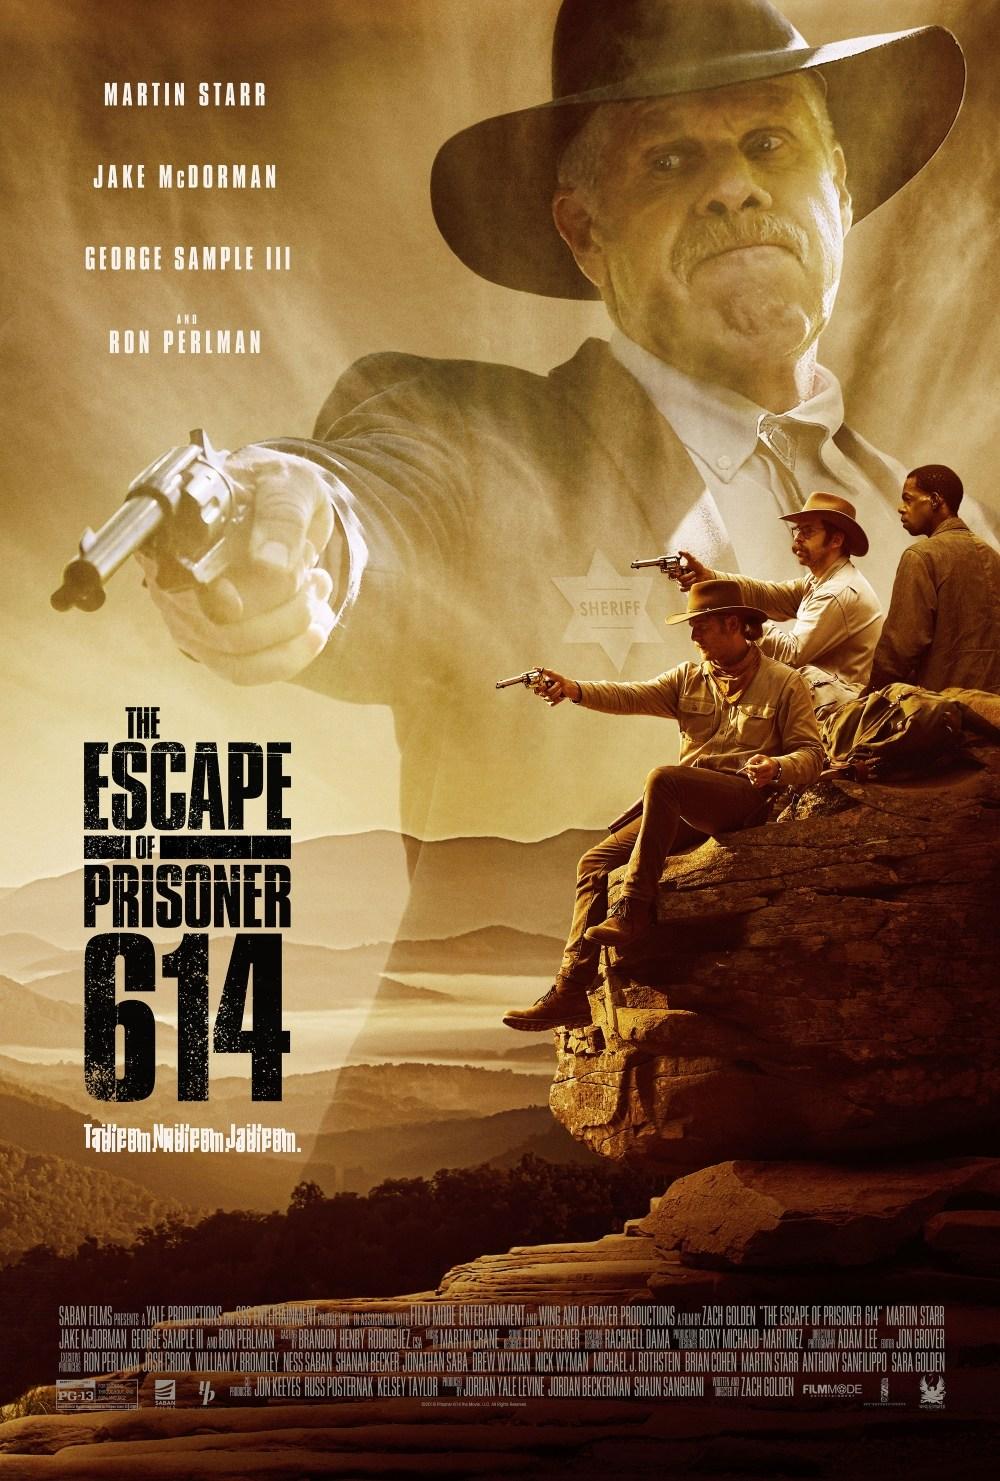 The-Escape-of-Prisoner-614-movie-poster.jpg